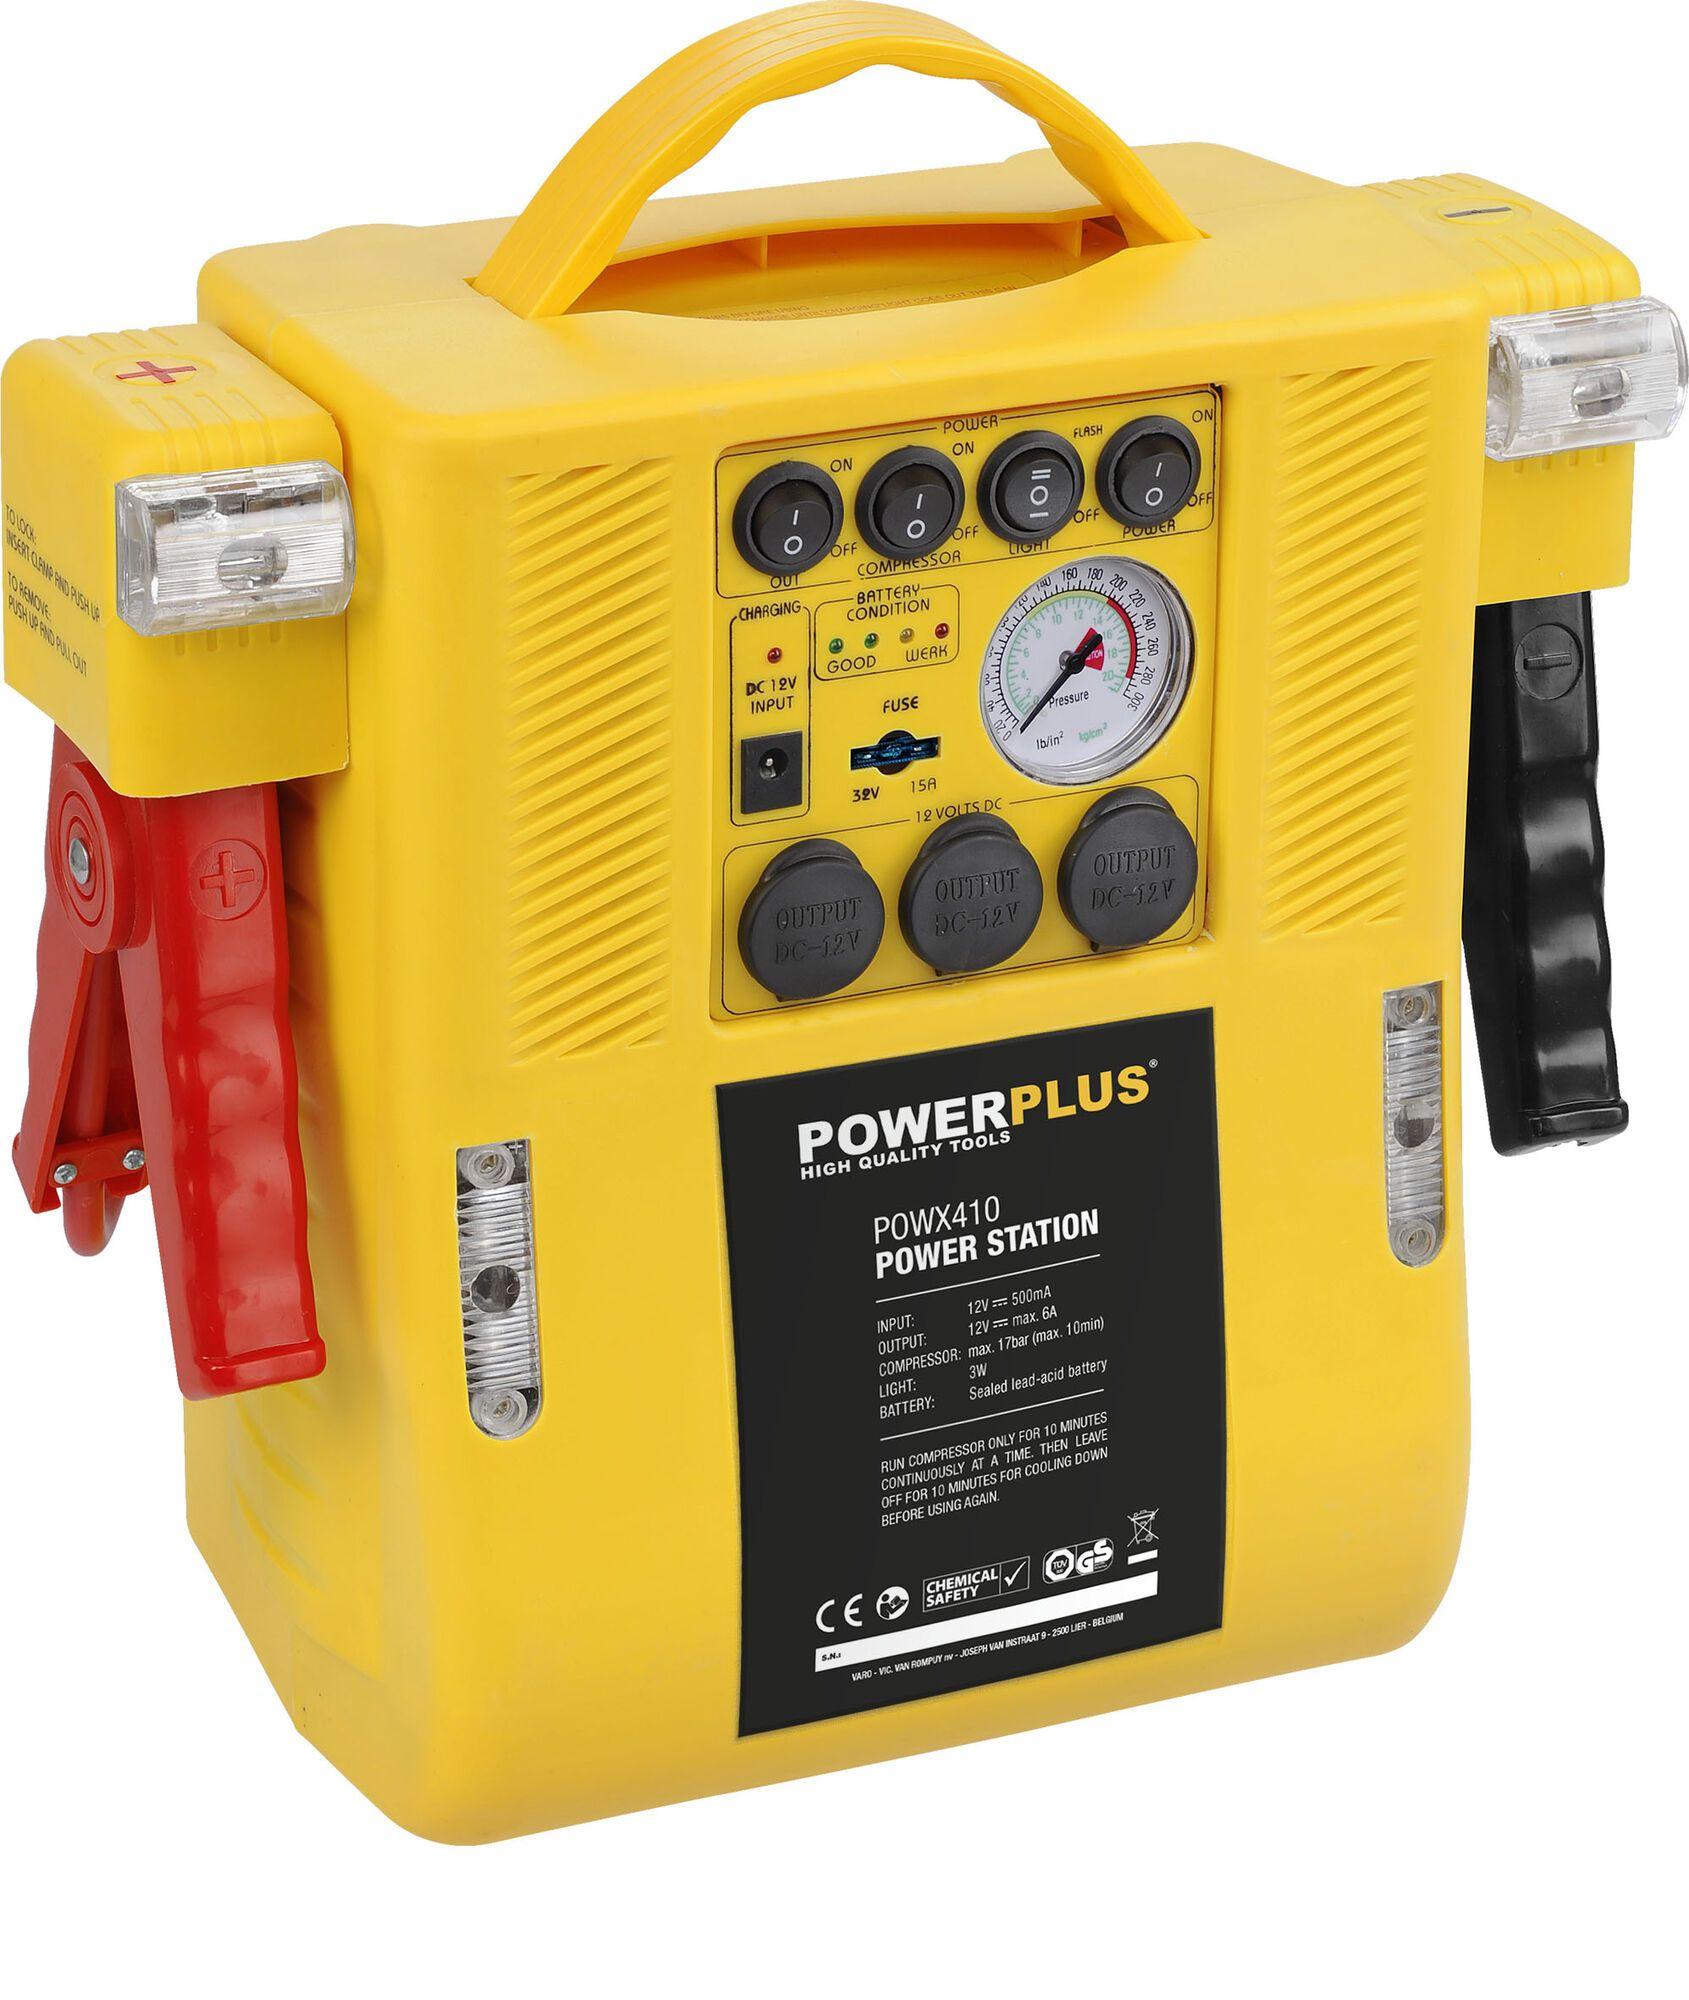 Powerplus POWX410 Energiestation | Compressor | Jumpstarter | Starthulp 4-in-1 (energiestation)